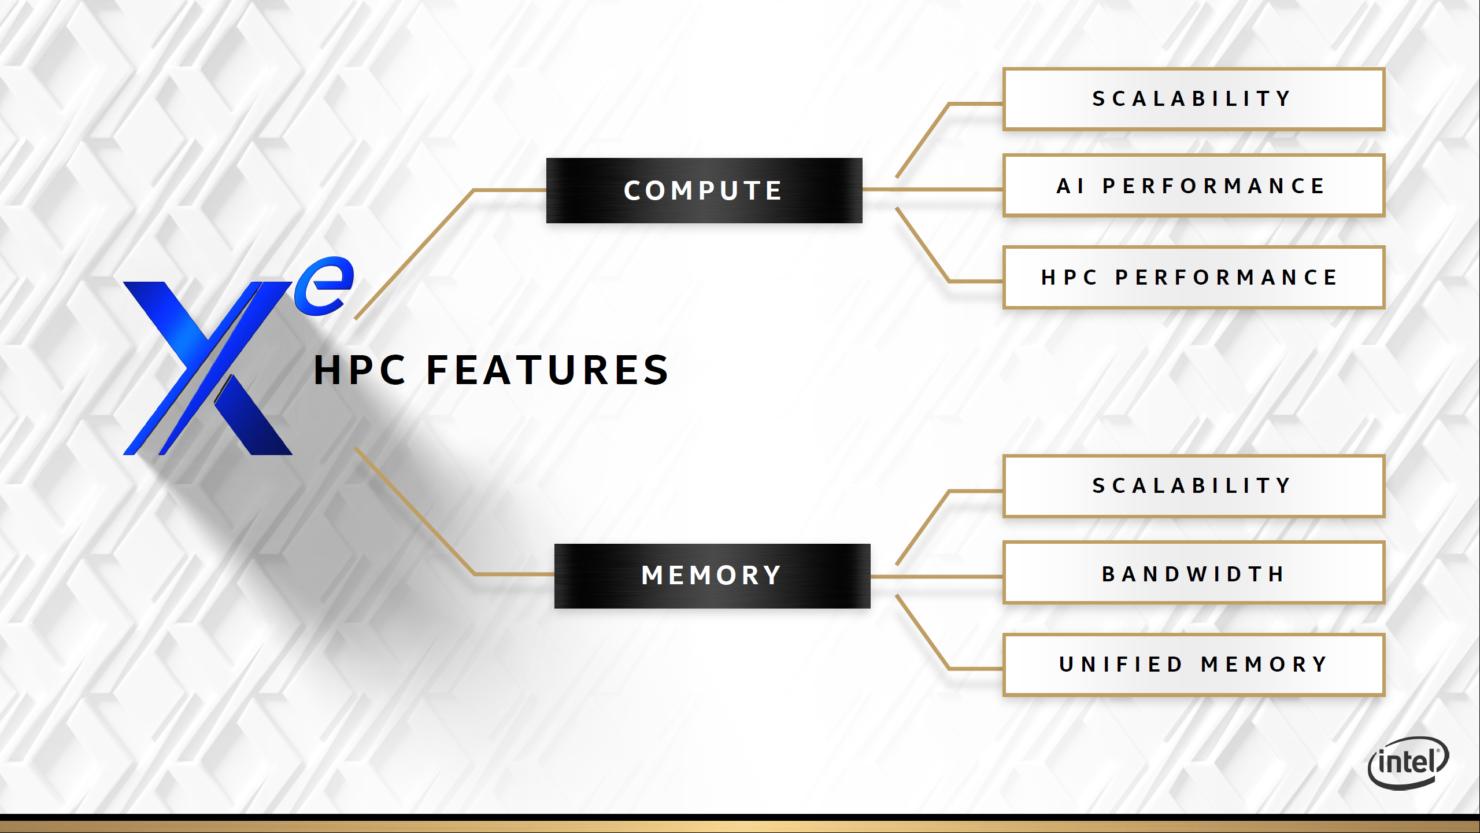 intel-xe-gpu_discrete-graphics-card_30